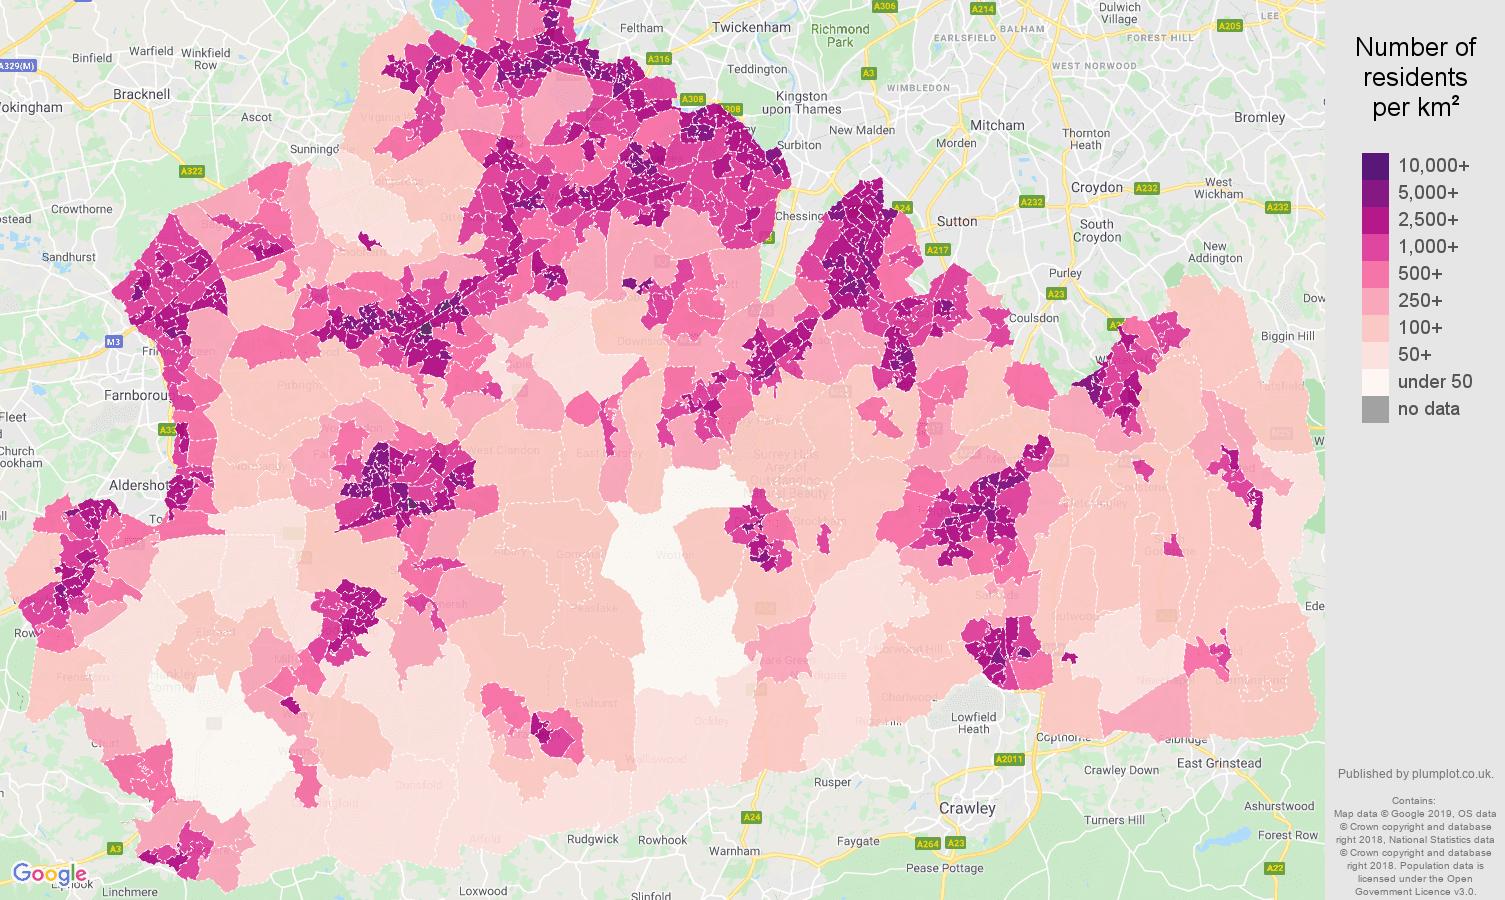 Surrey population density map